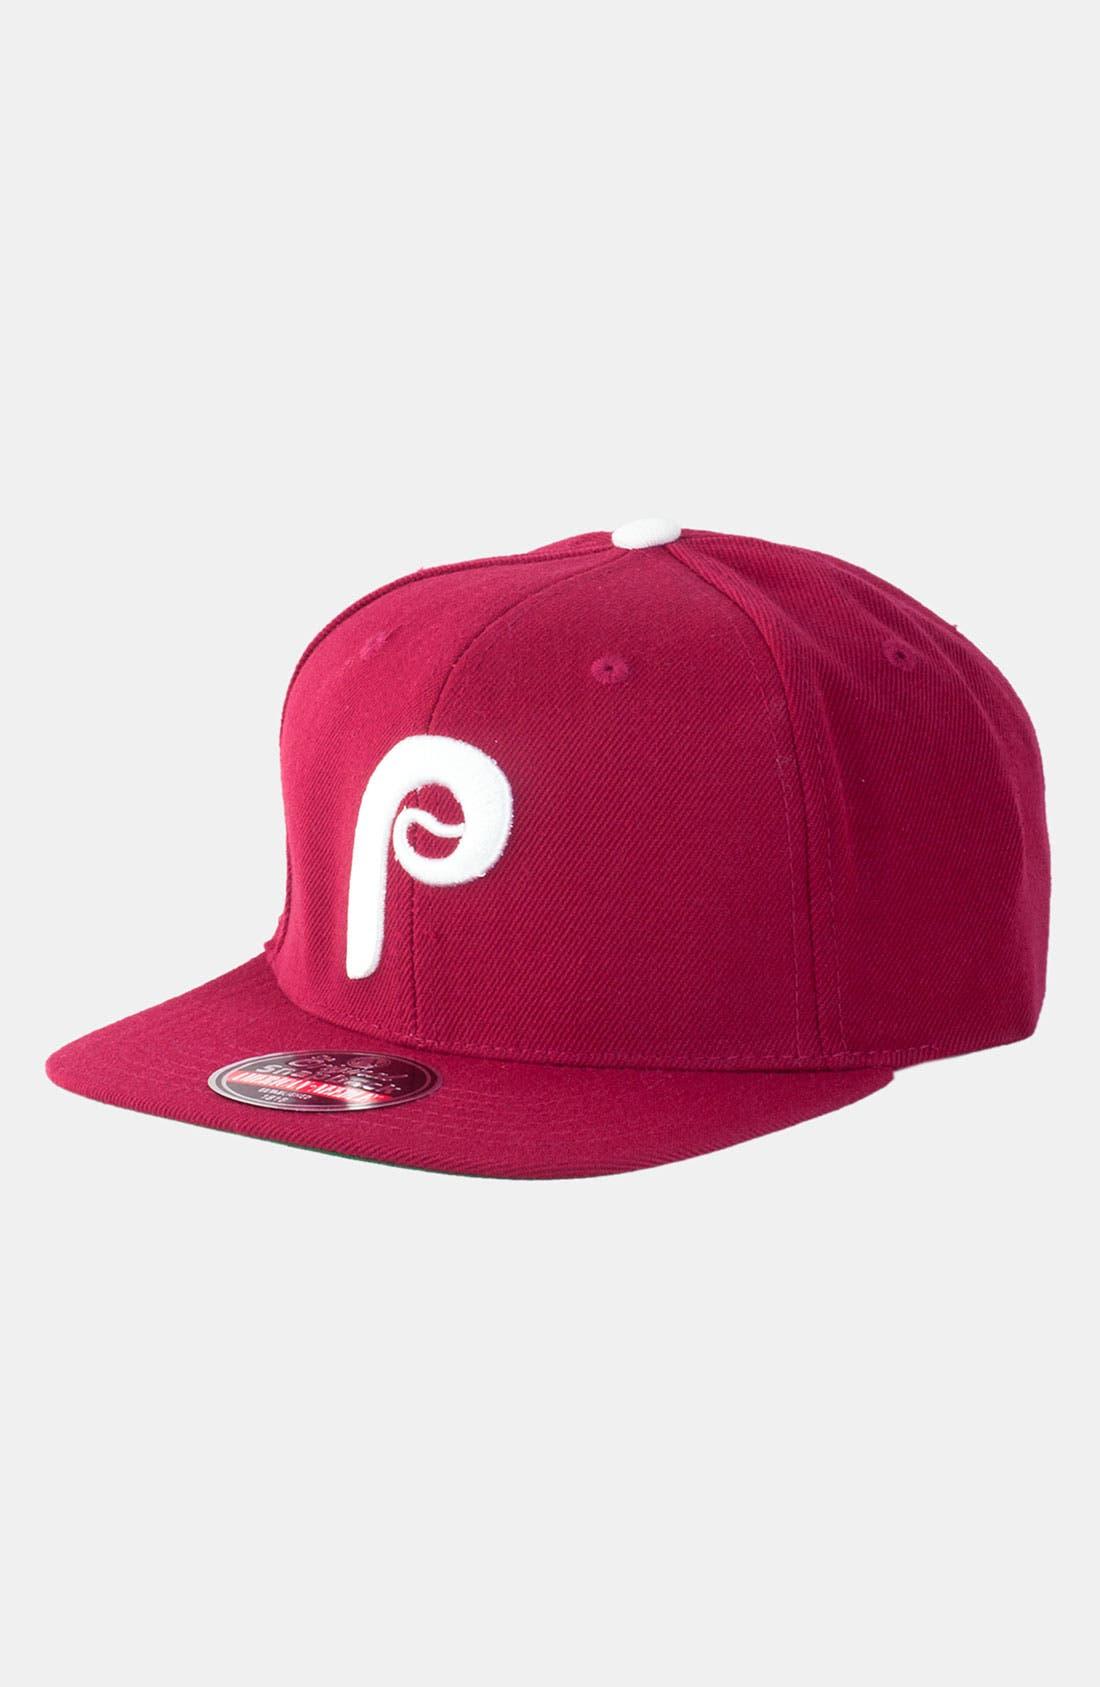 Main Image - American Needle 'Philadelphia Phillies - Cooperstown' Snapback Baseball Cap